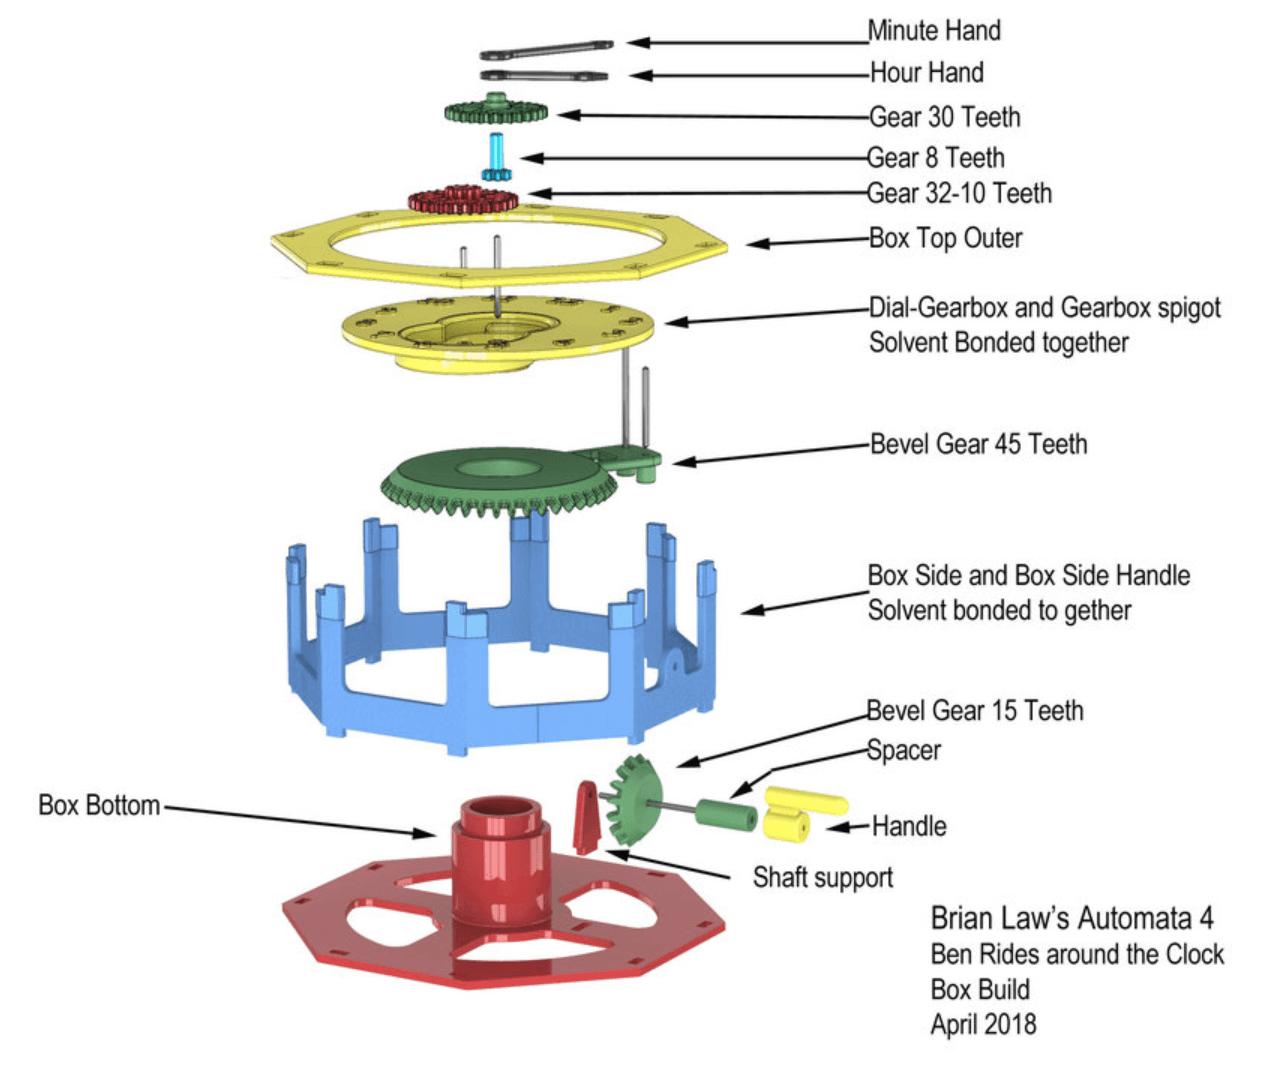 Capture d'écran 2018-04-25 à 09.43.46.png Download free STL file Automata-4 Ben rides around the clock • 3D printer template, woodenclocks